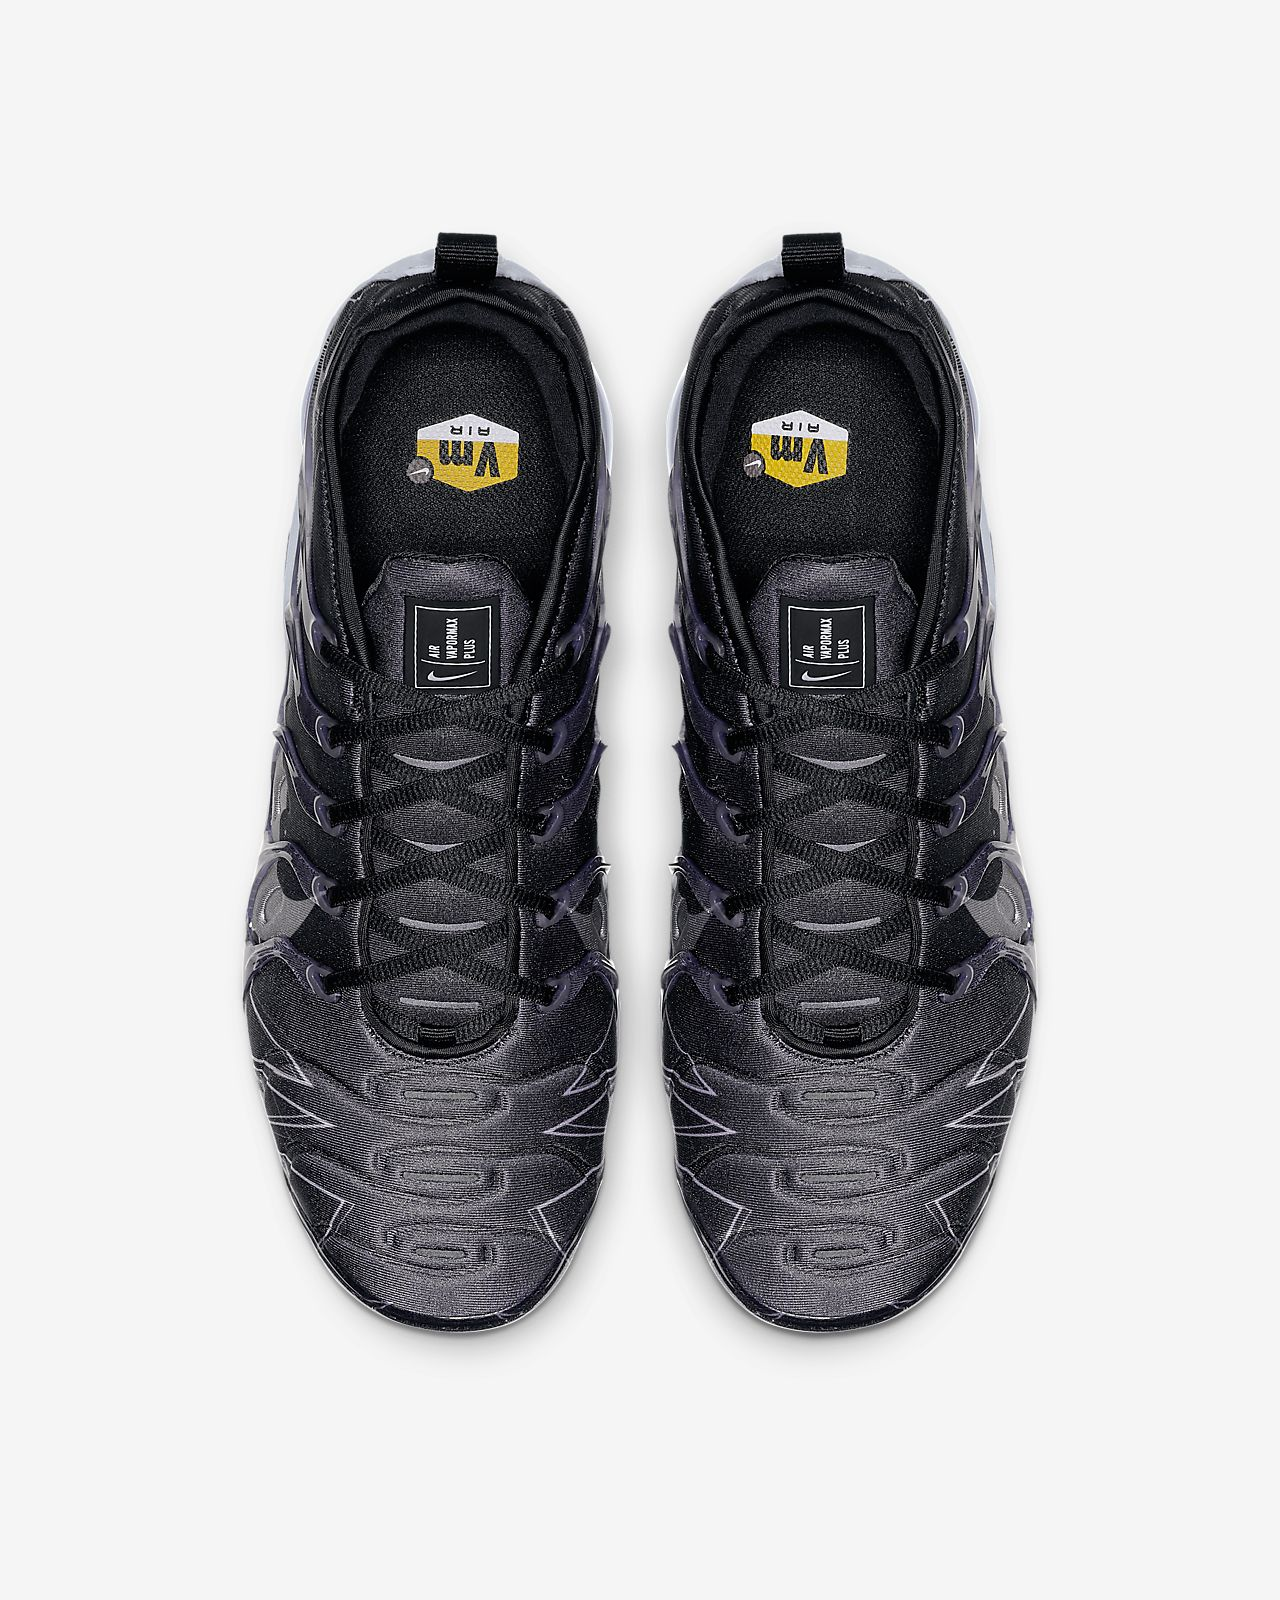 super popular 5a221 98113 ... Nike Air VaporMax Plus Men s Shoe